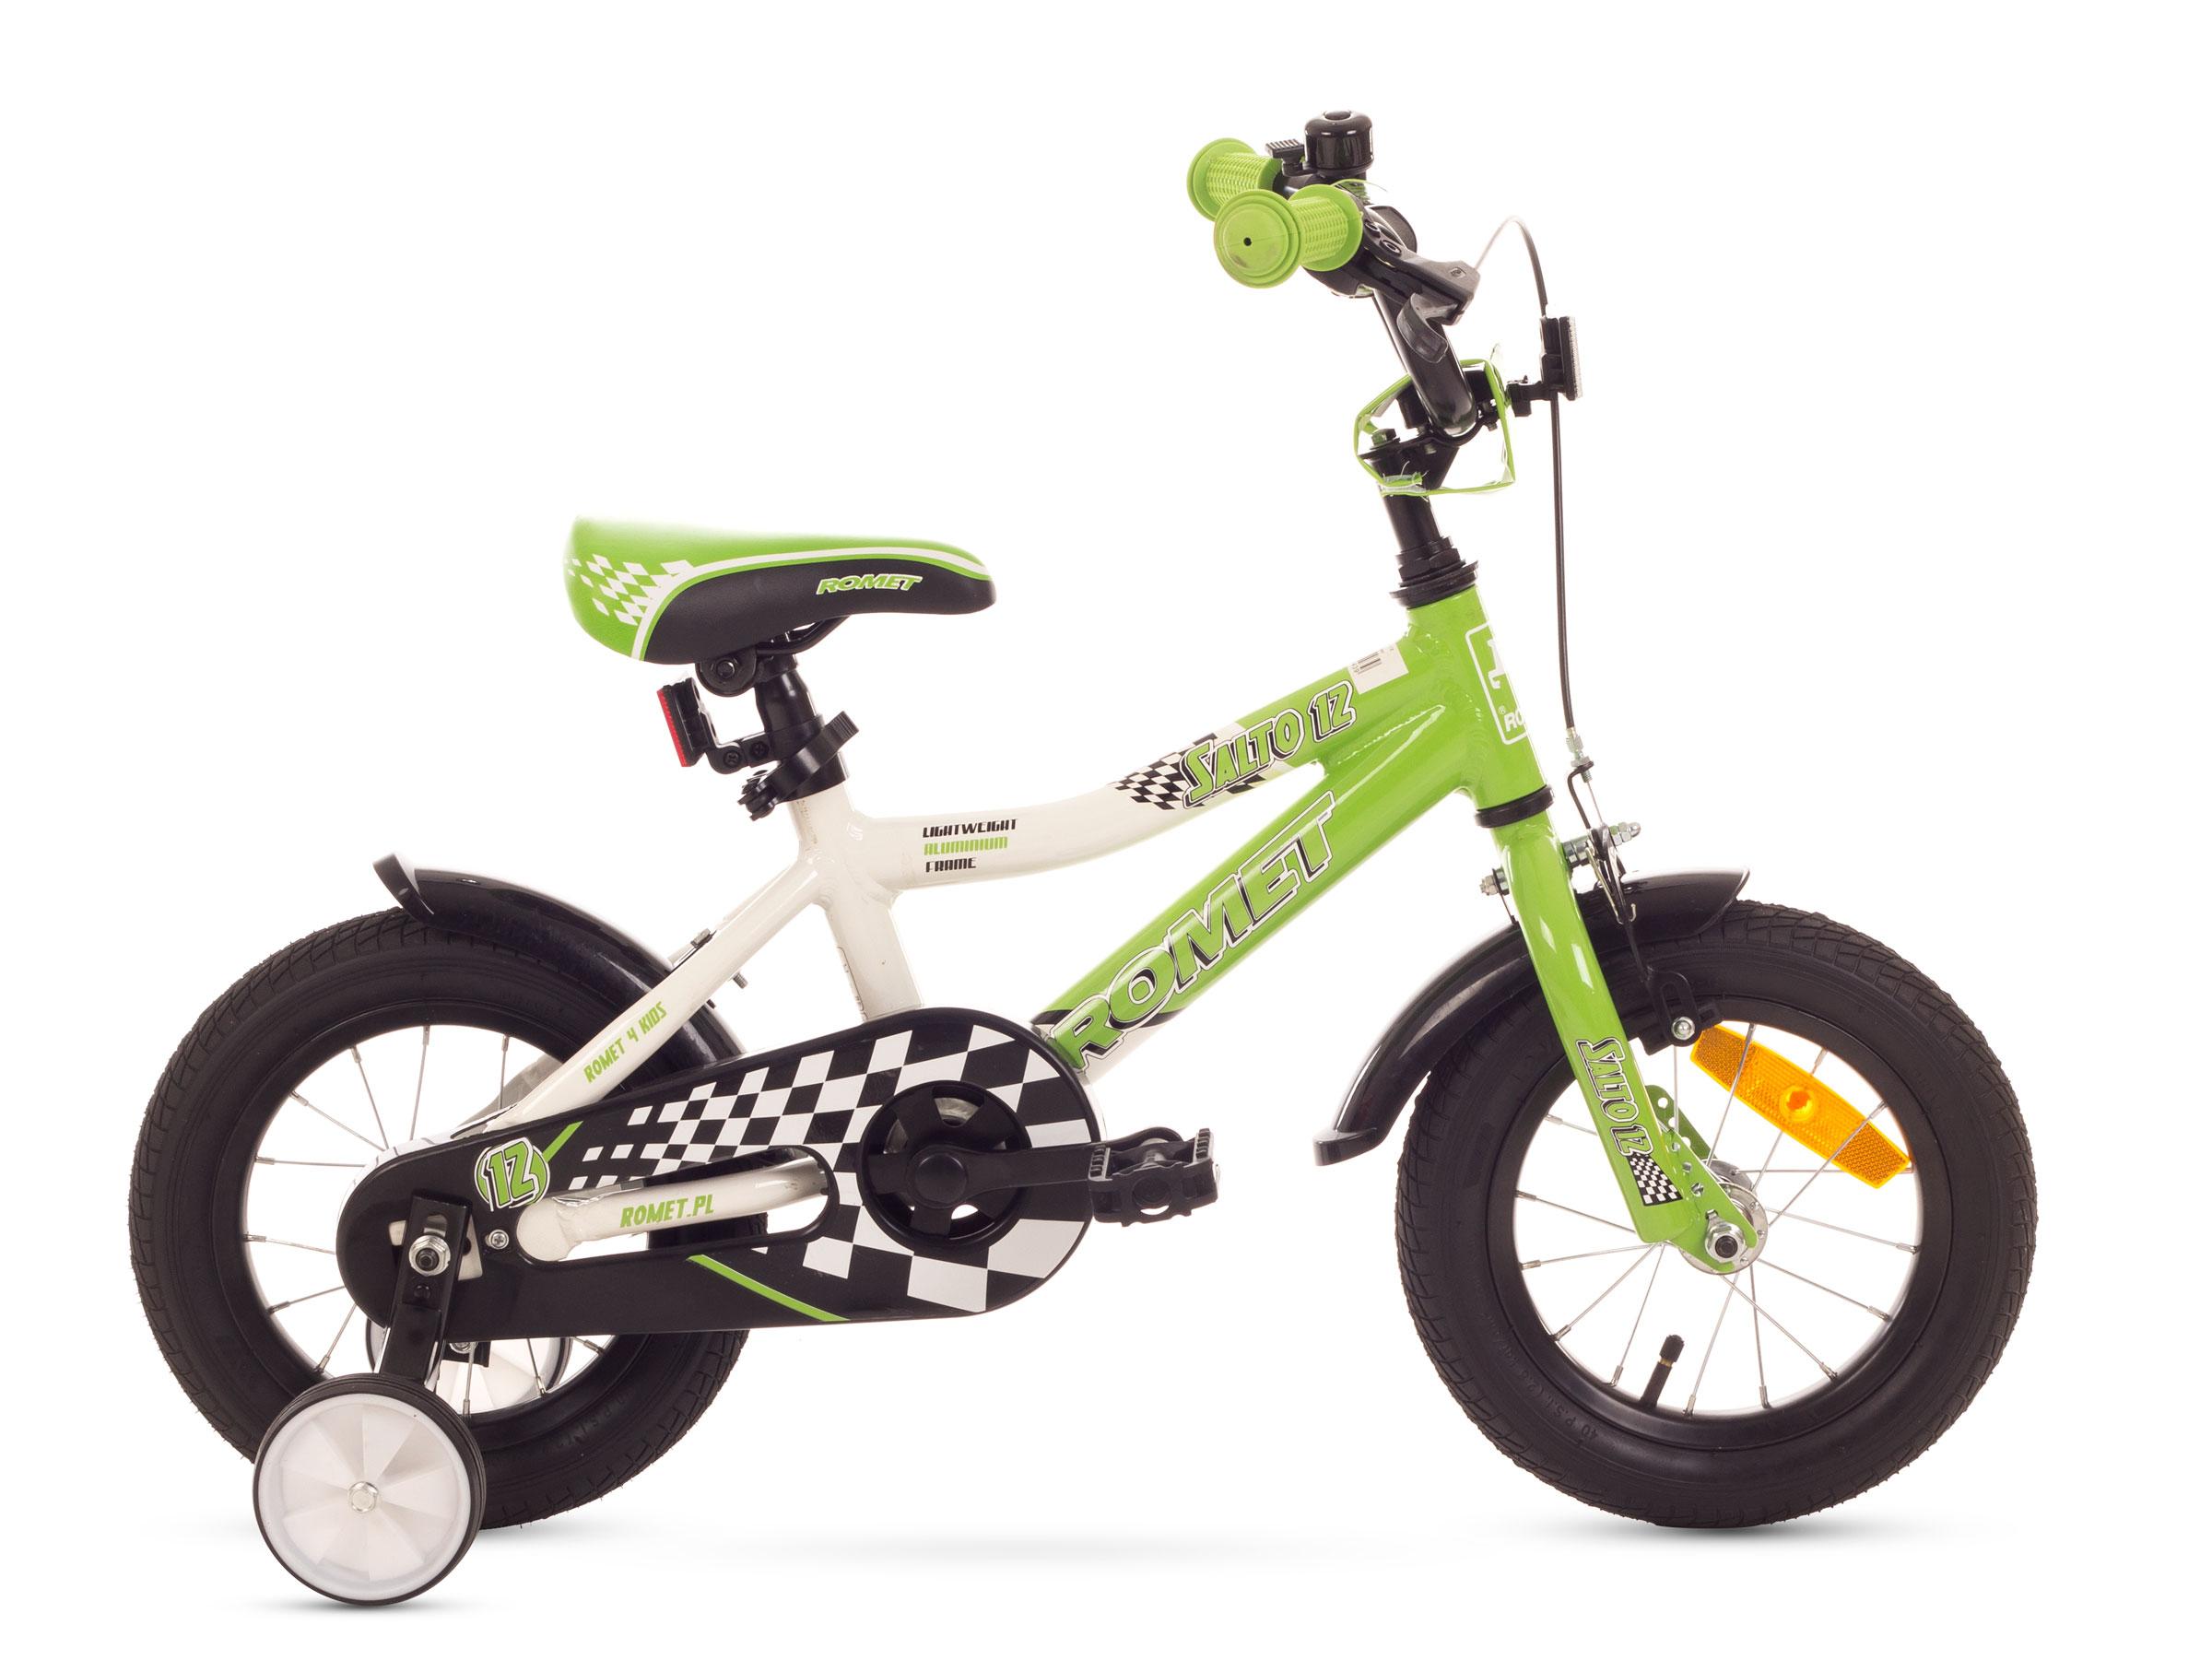 Bicicleta Pentru Copii Romet Salto 12 Alb-verde 2016